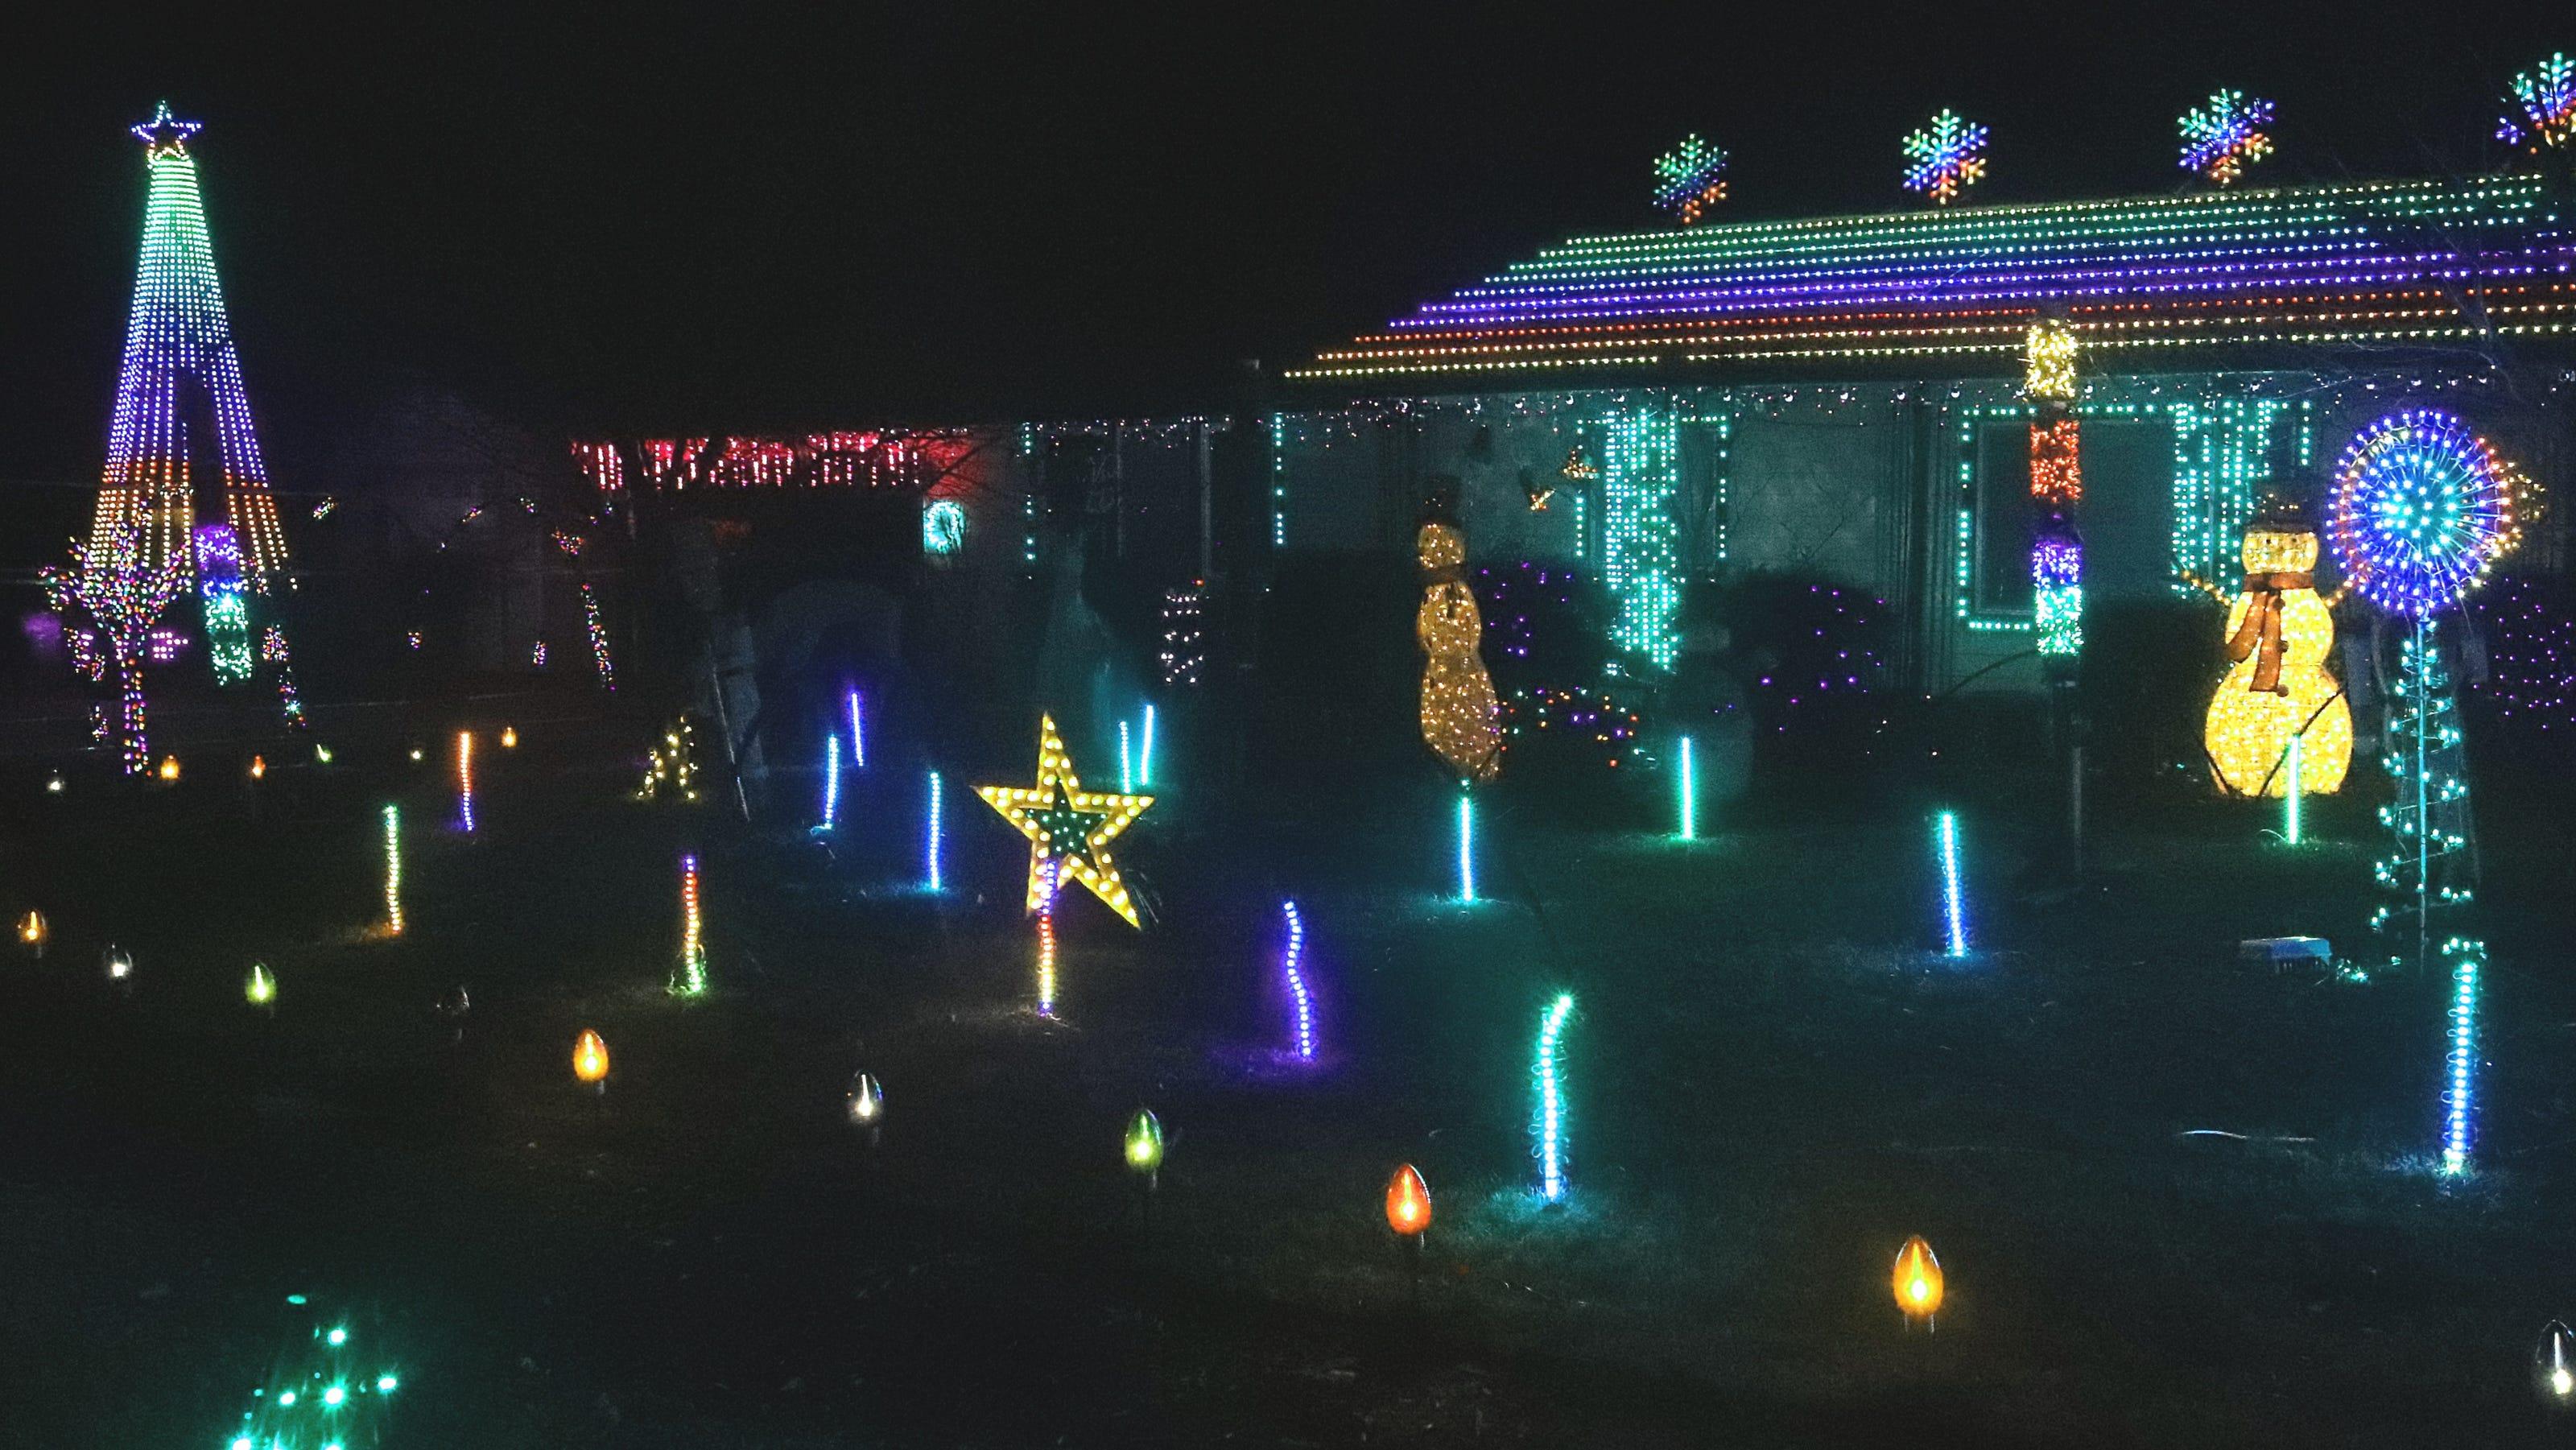 Palo Cedro Country Christmas 2021 Christmas Lights In Palo Cedro Home Set Aglow On Hillside Drive